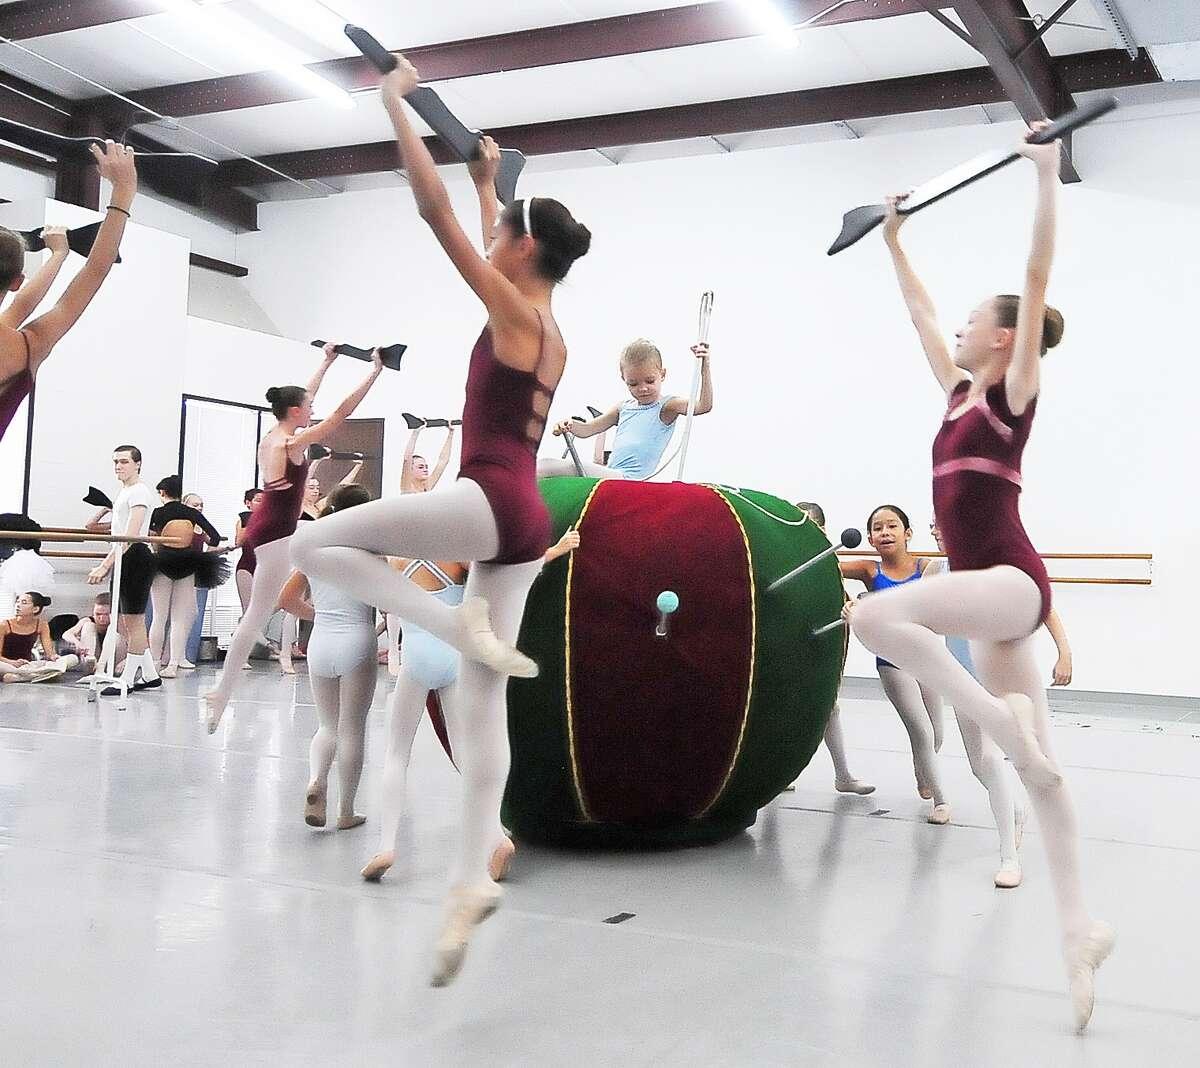 Dancers practice for The Nutcracker at American Ballet Theatre dance studio Saturday 11/16/13.